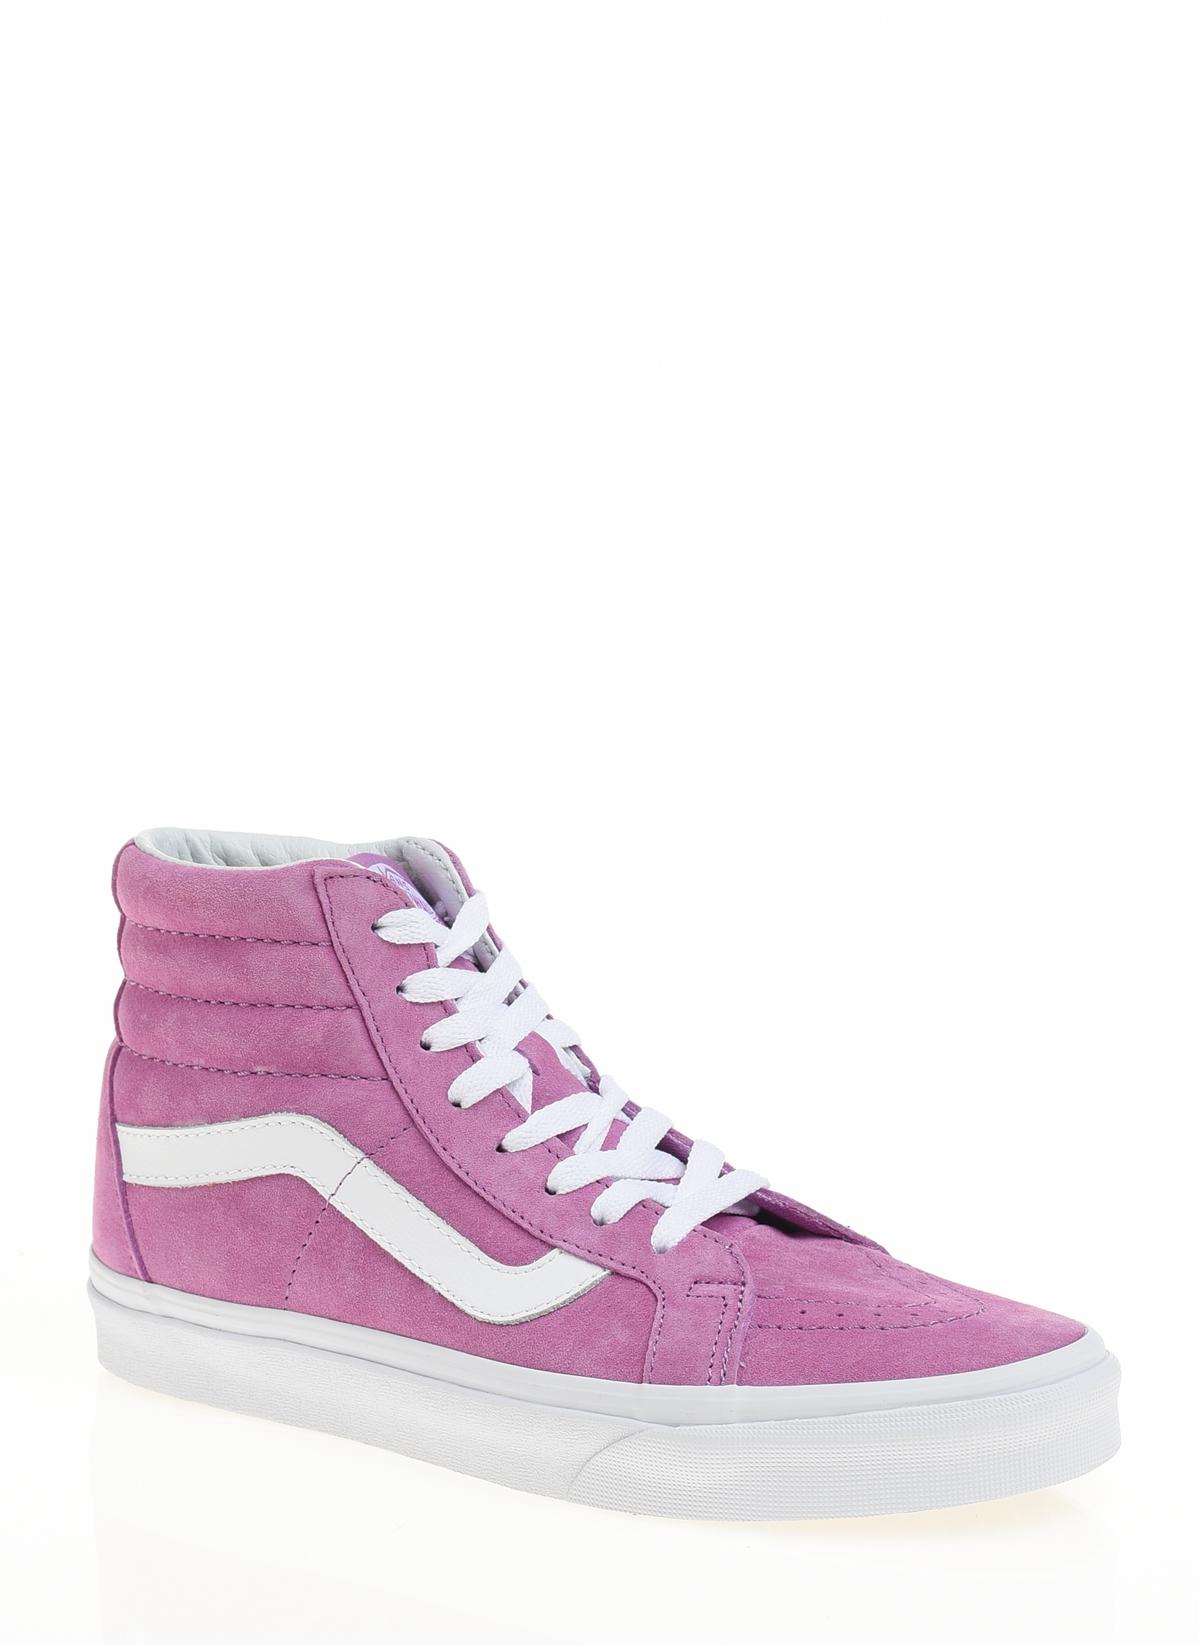 Vans SK8-Hi Reissue Pink